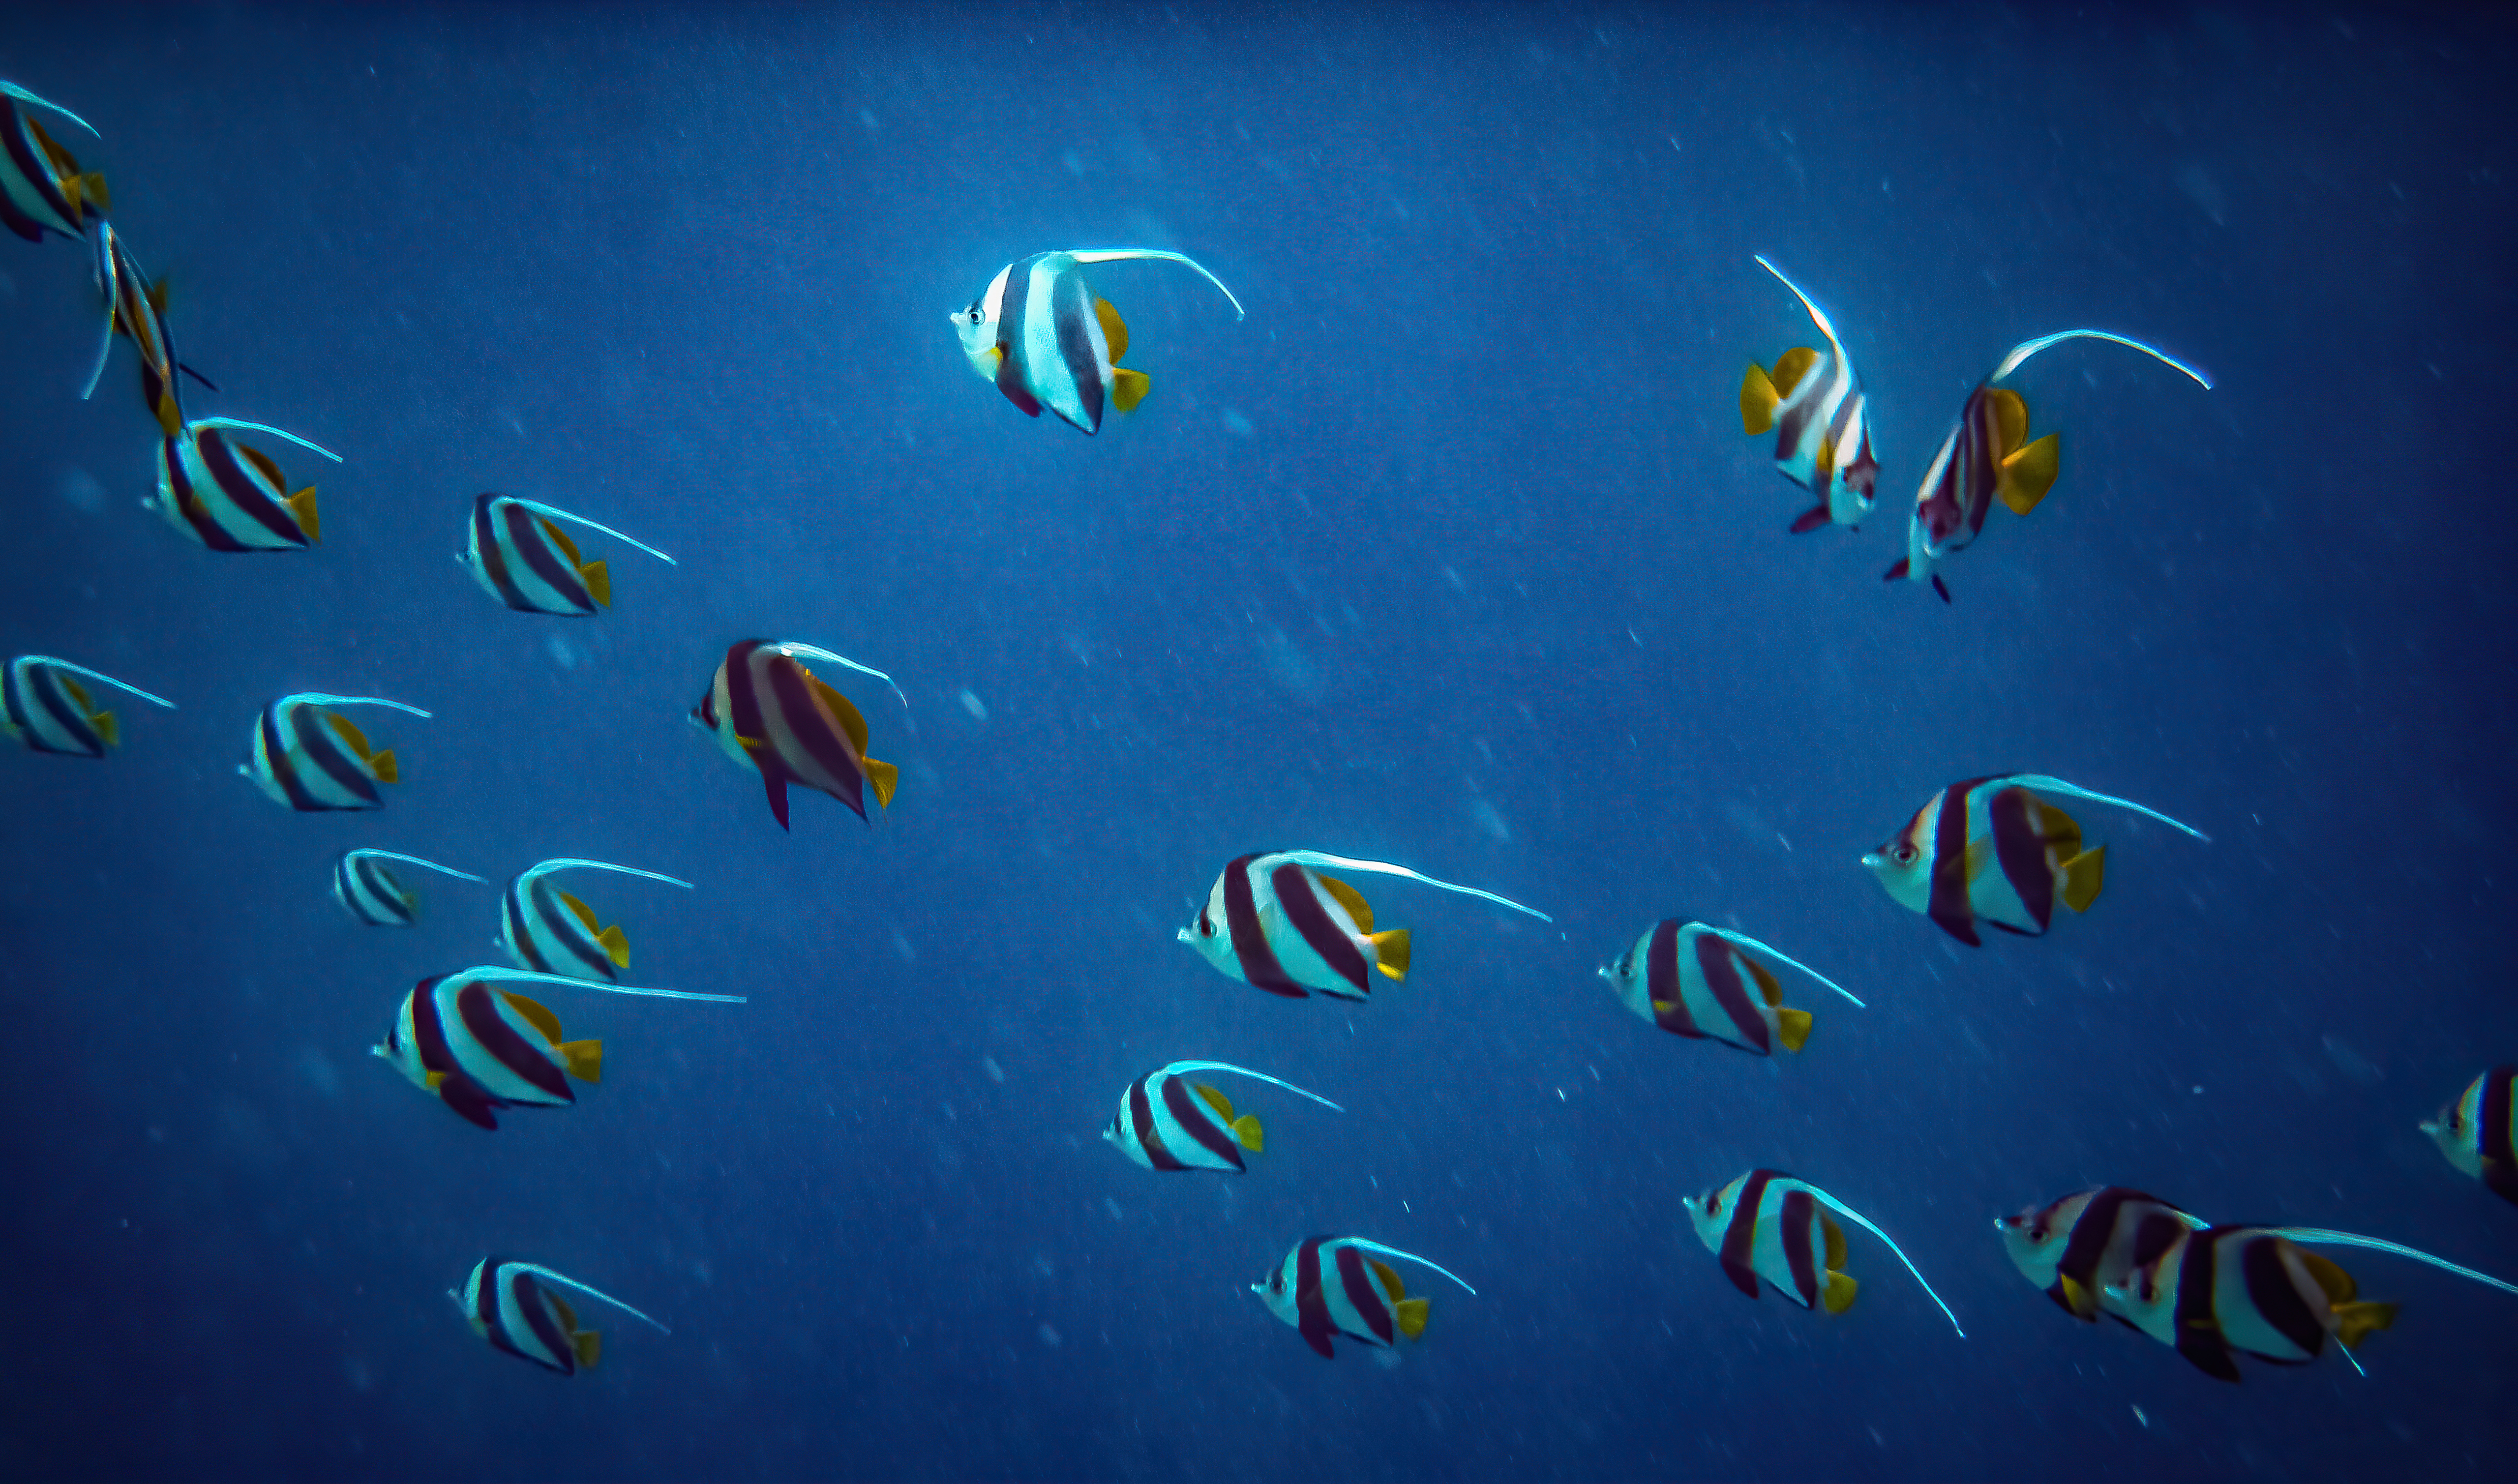 pennant coralfish 4k 1629139585 - Pennant Coralfish 4k - Pennant Coralfish wallpapers, Pennant Coralfish 4k wallpapers